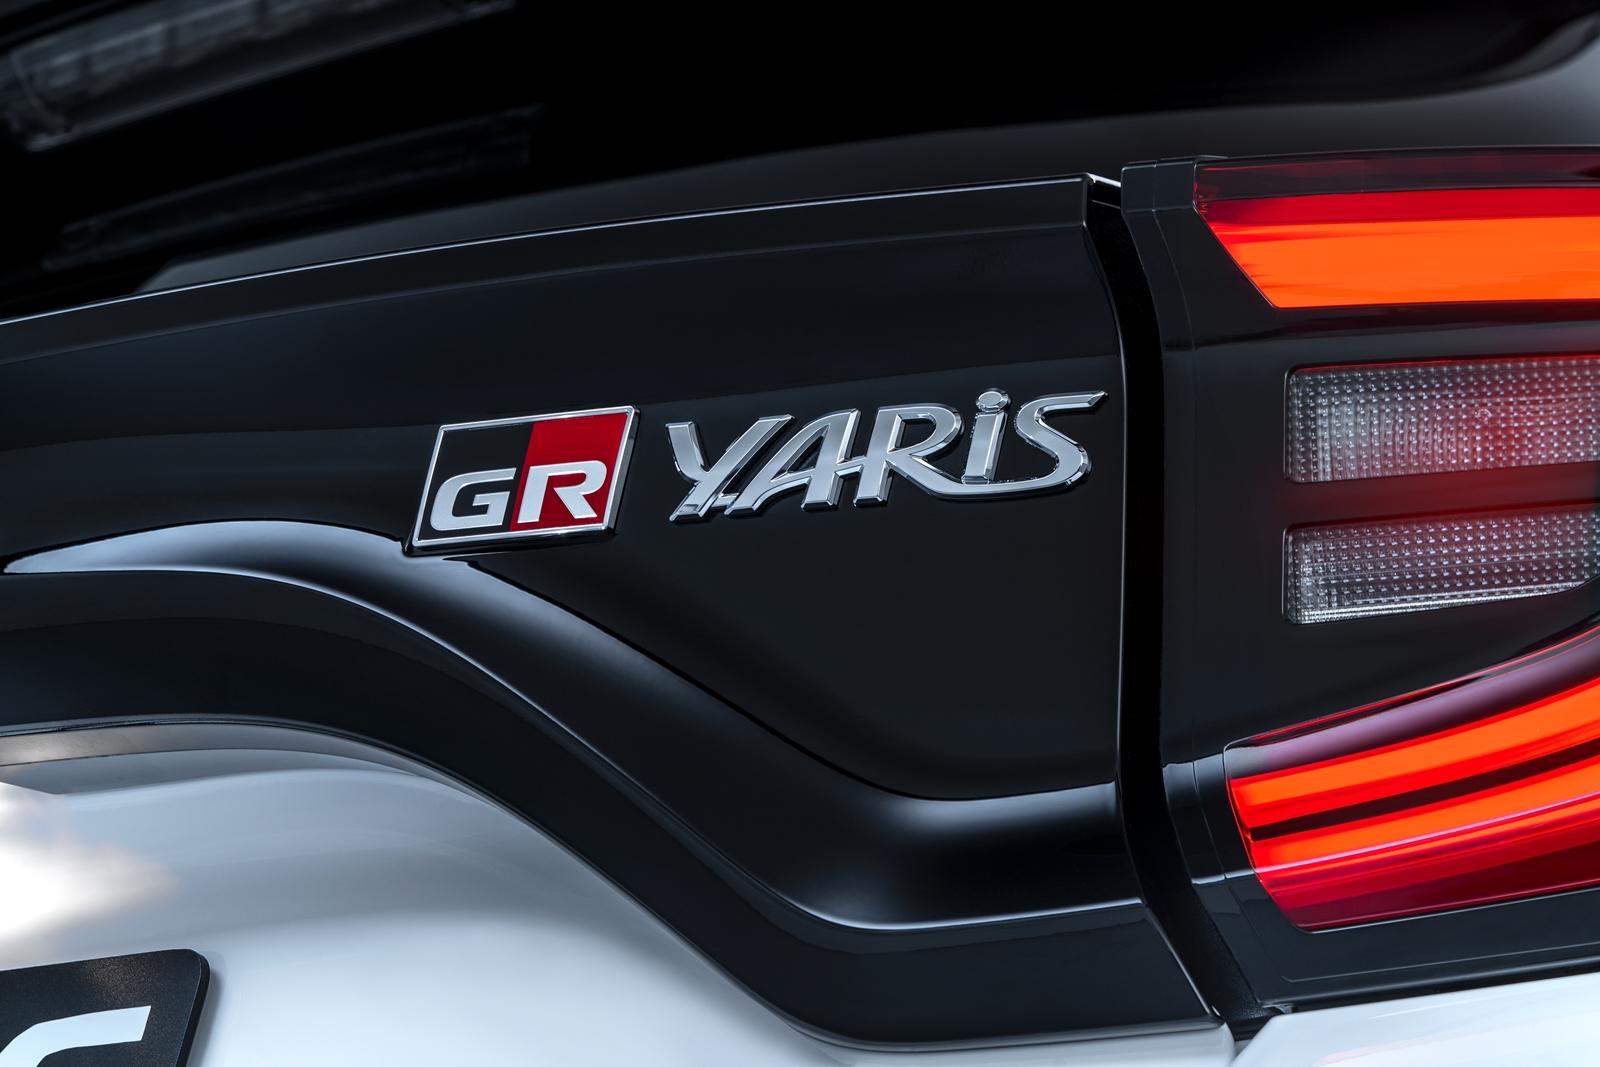 Toyota Gr Yaris (2)